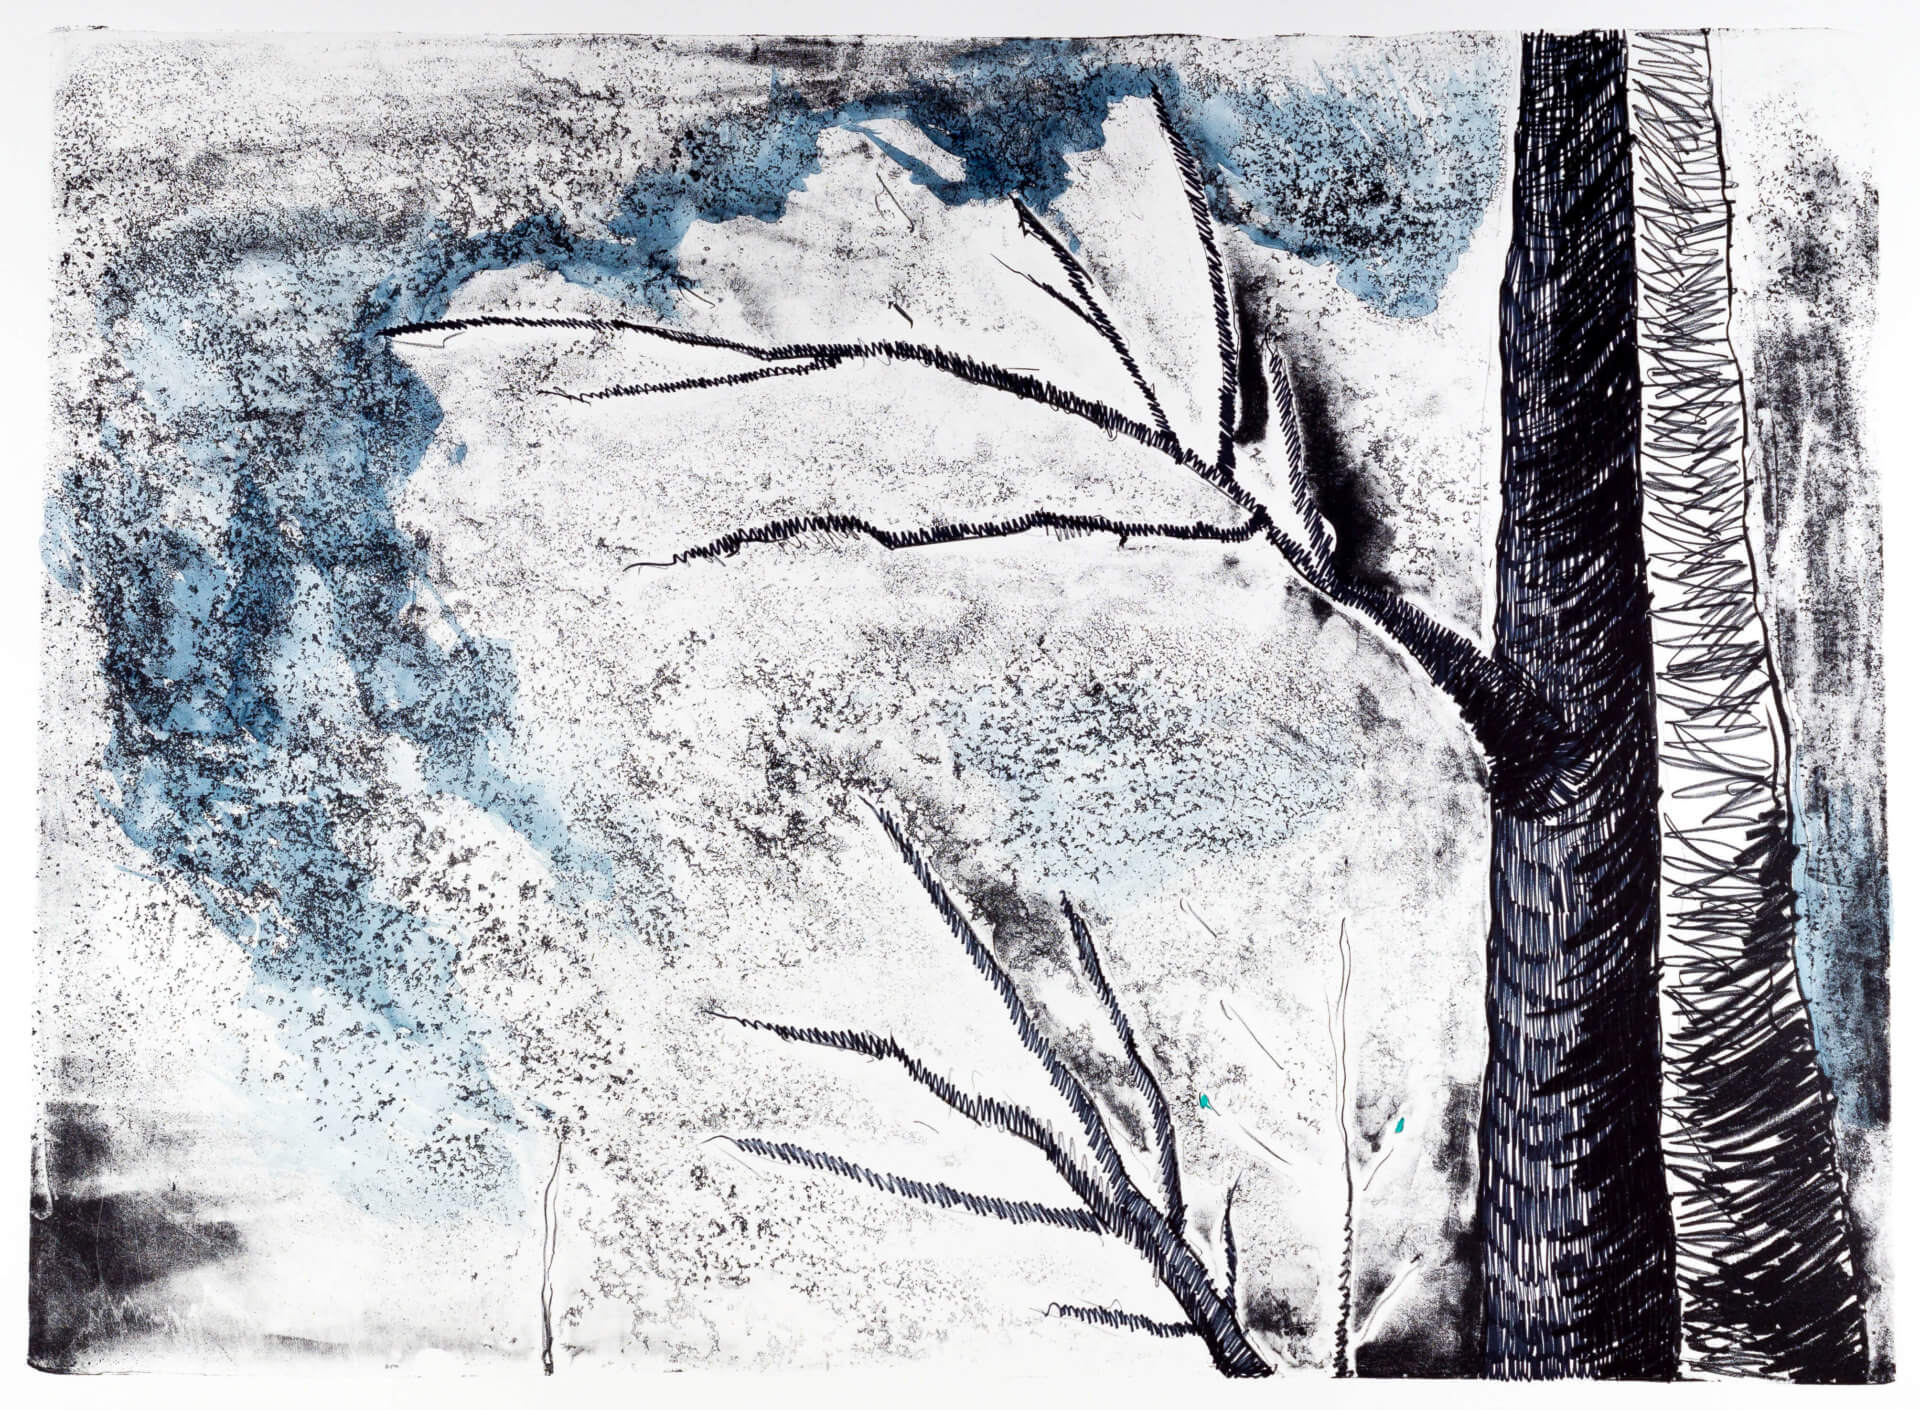 Katharina Albers, Wald (F_A)(G), 2015, Lithographie handkoloriert (Ölkreide, Graphit, Aquarellfarbe, Fineliner), Unikat, 70×100 cm